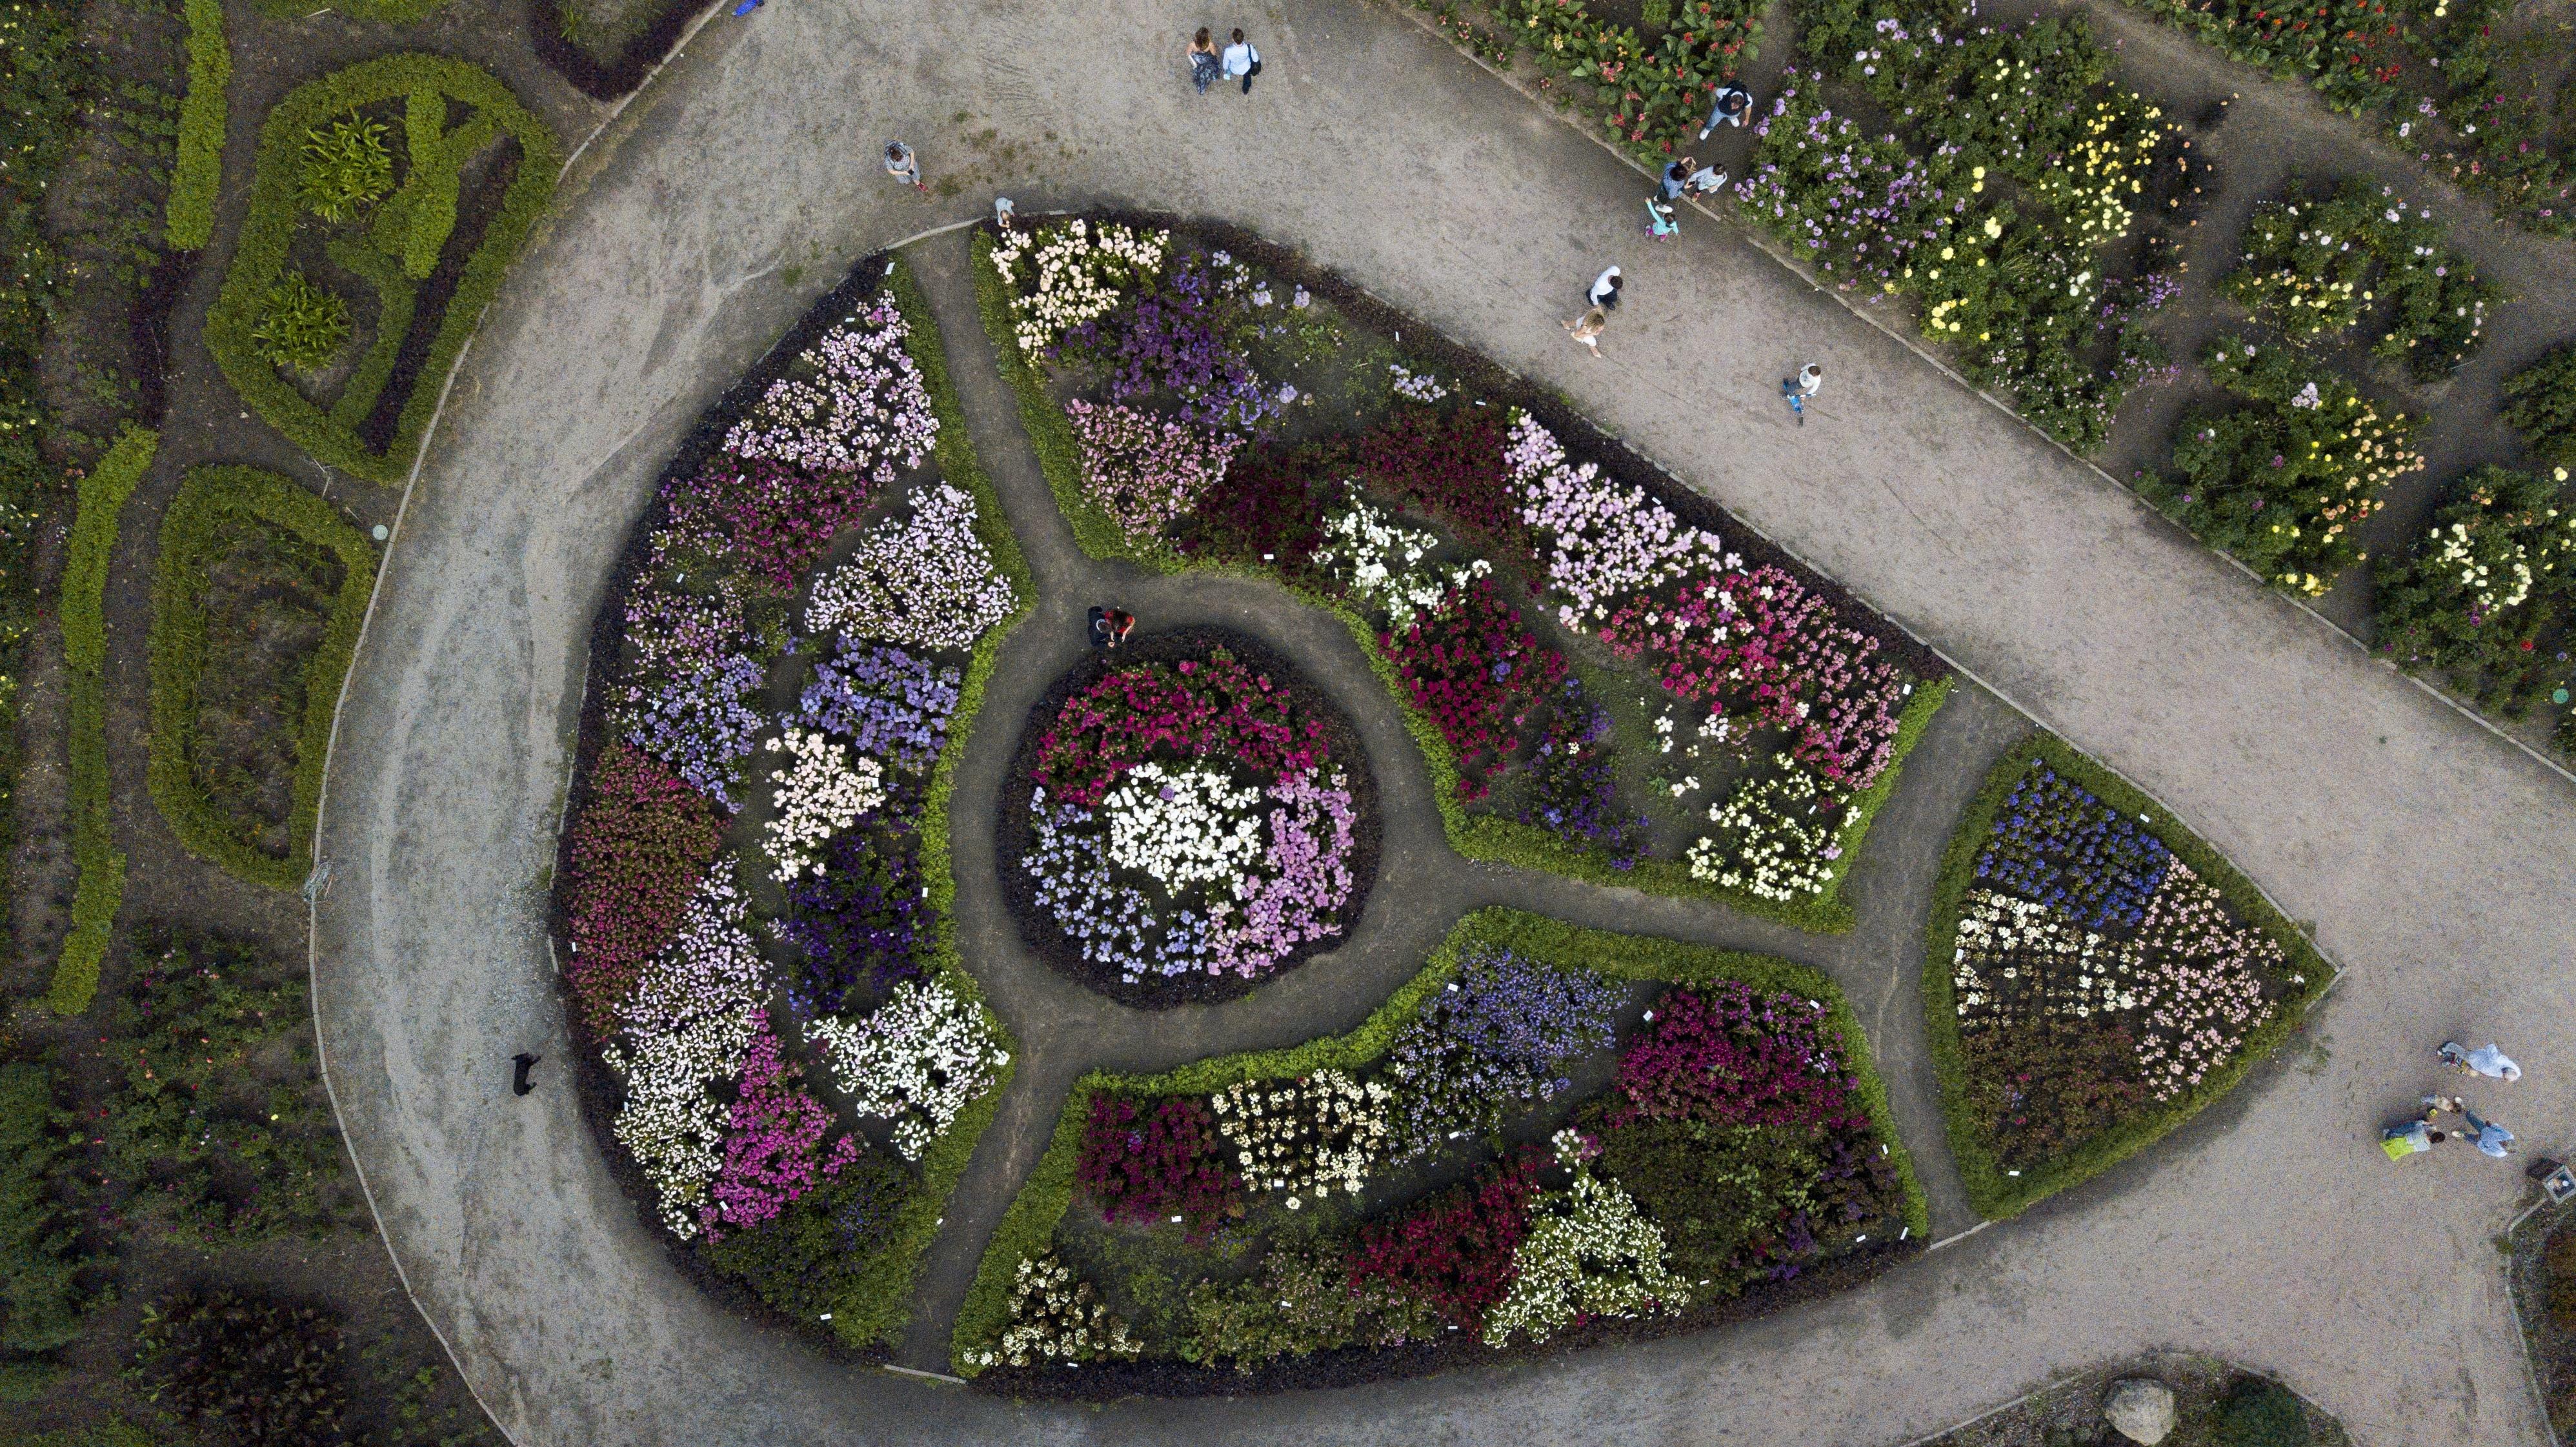 bird's eye view photography of flower field